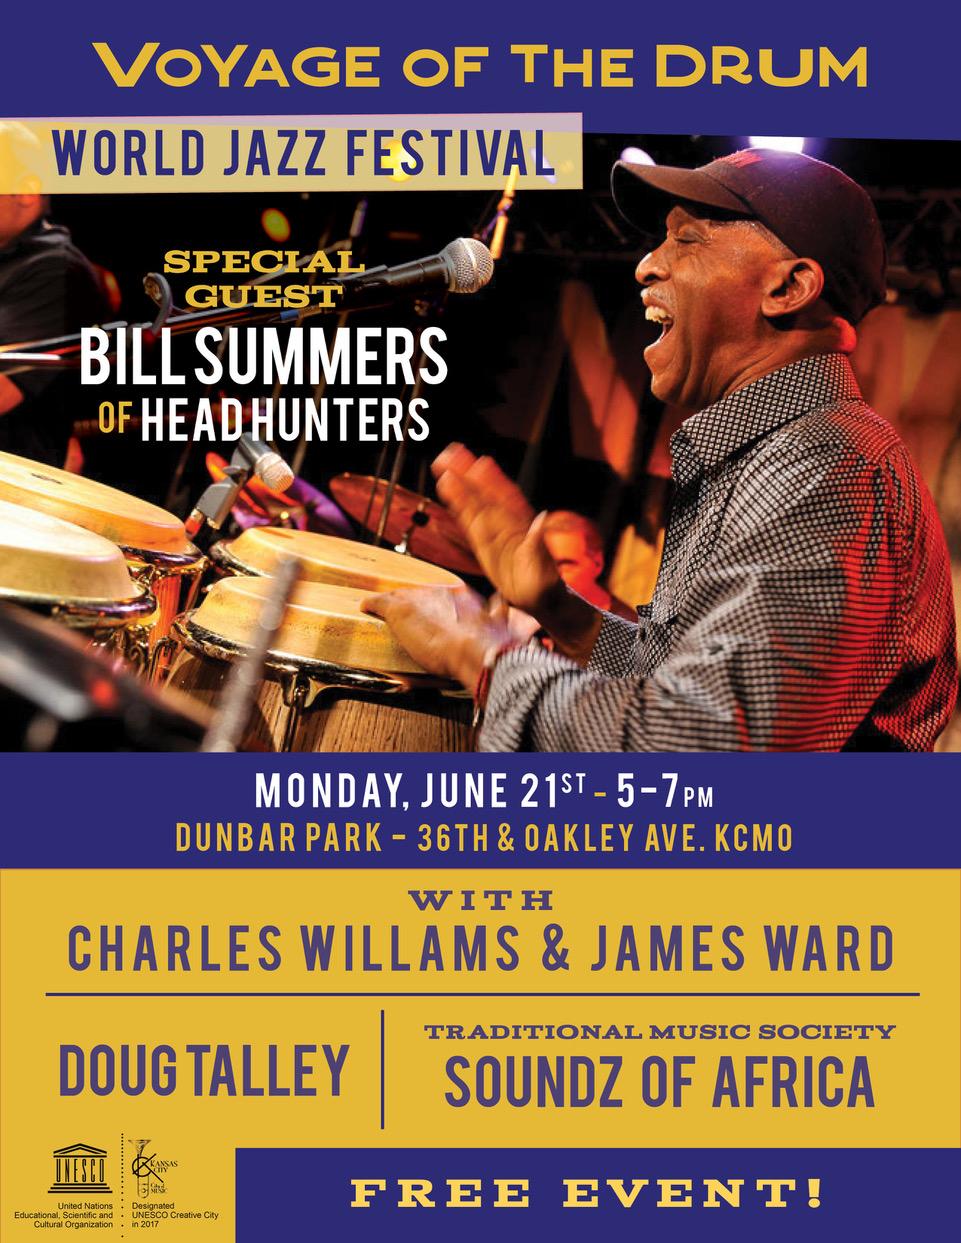 Voyage of the Drum World Jazz Festival